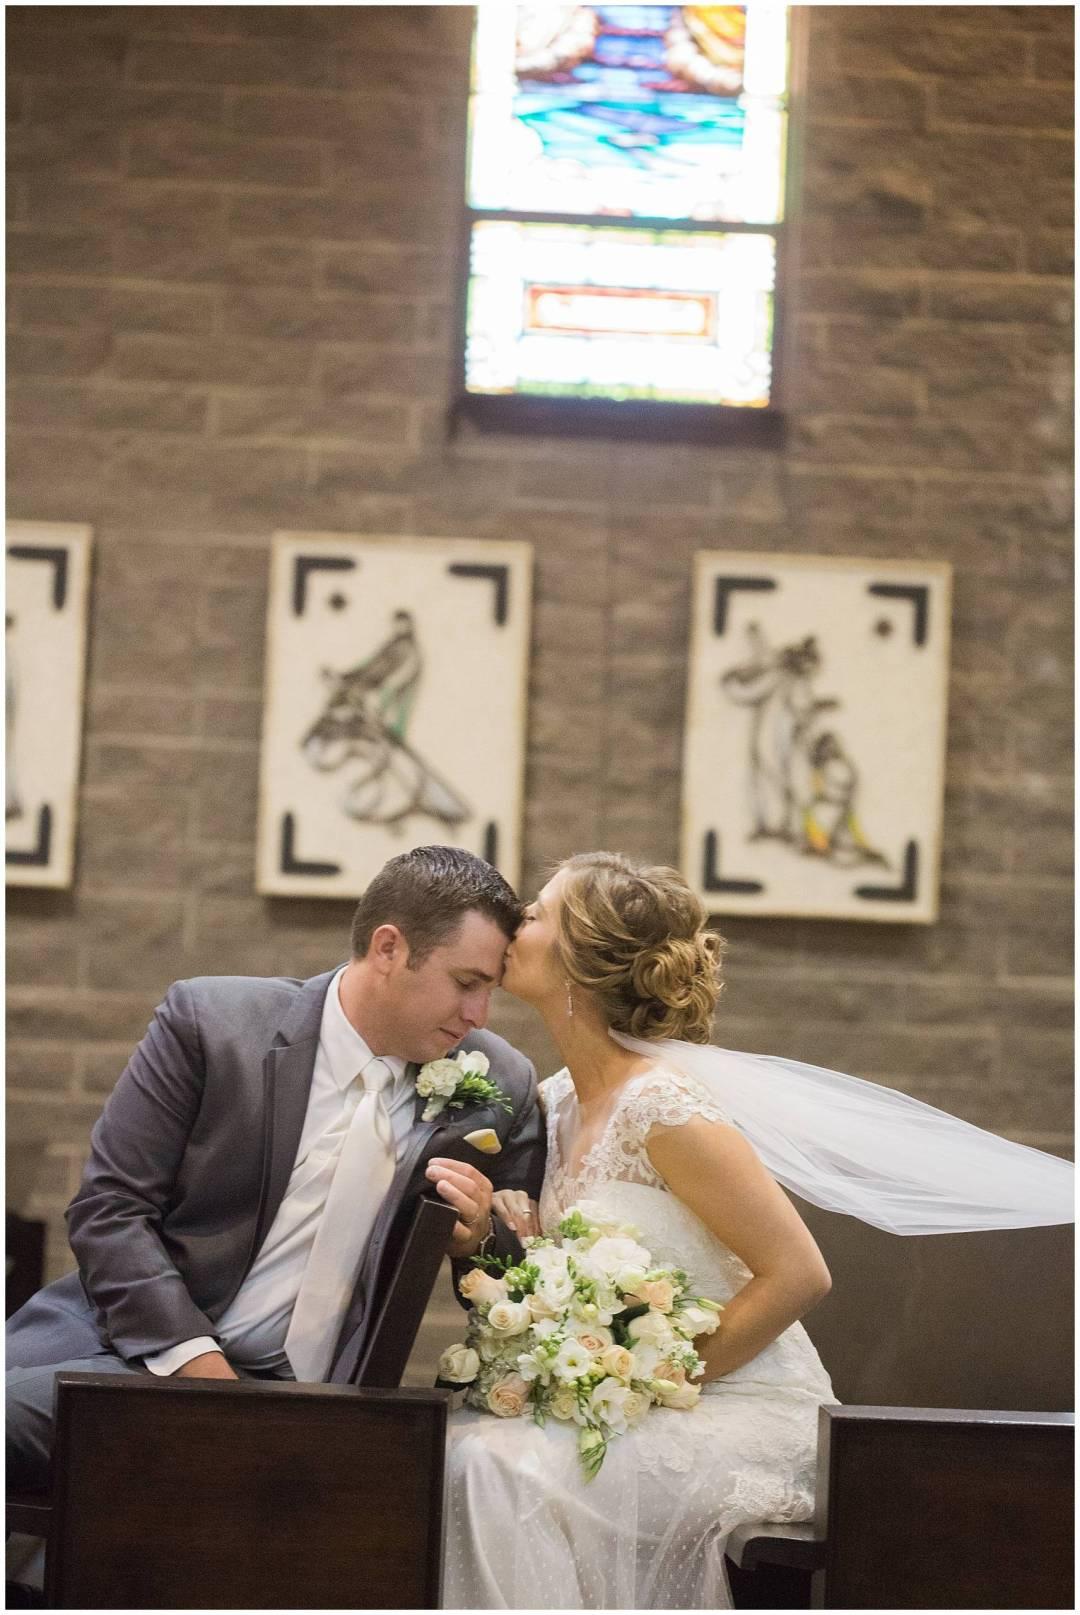 Kelcie & Devin Wedding Third Element Photography & Cinema Koetsier Ranch Visalia Tulare Fresno Hybrid Film Wedding Photographer_0022